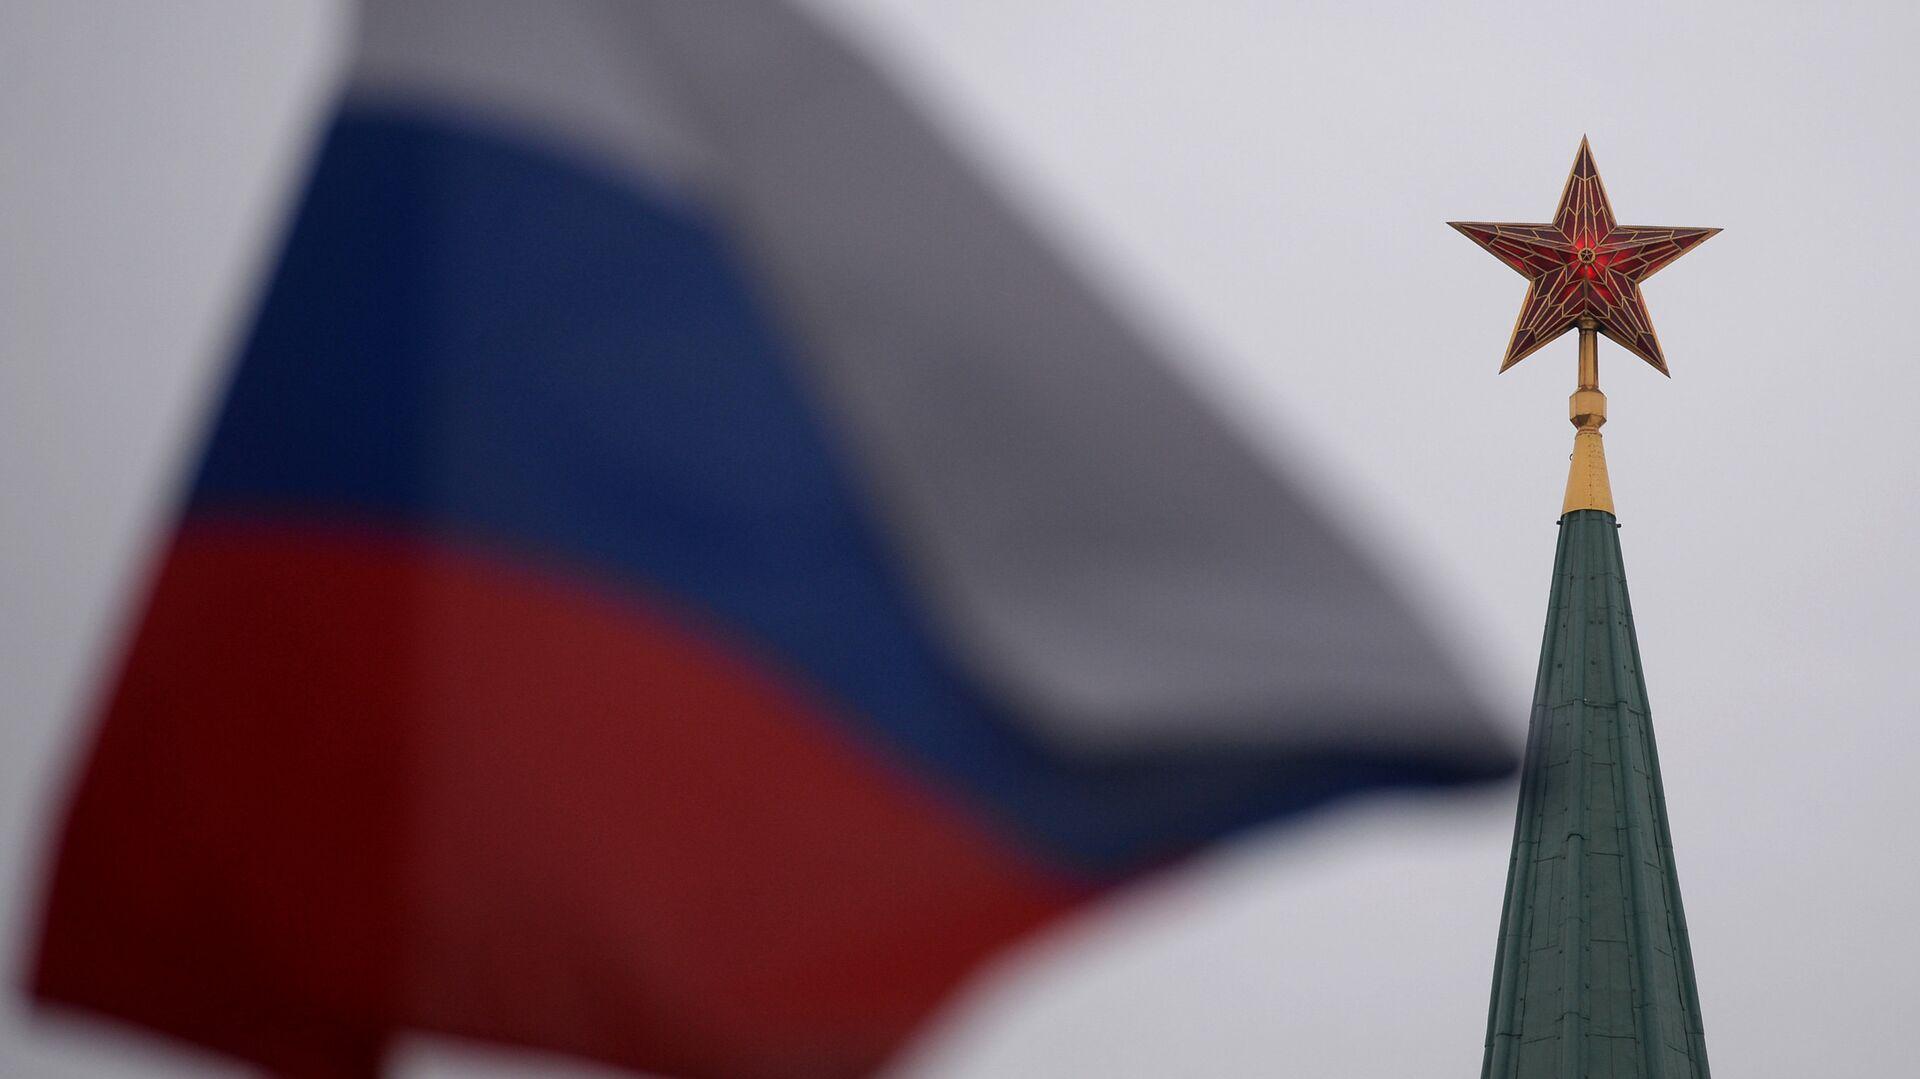 Bandera de Rusia en la Plaza Roja en Moscú - Sputnik Mundo, 1920, 15.04.2021